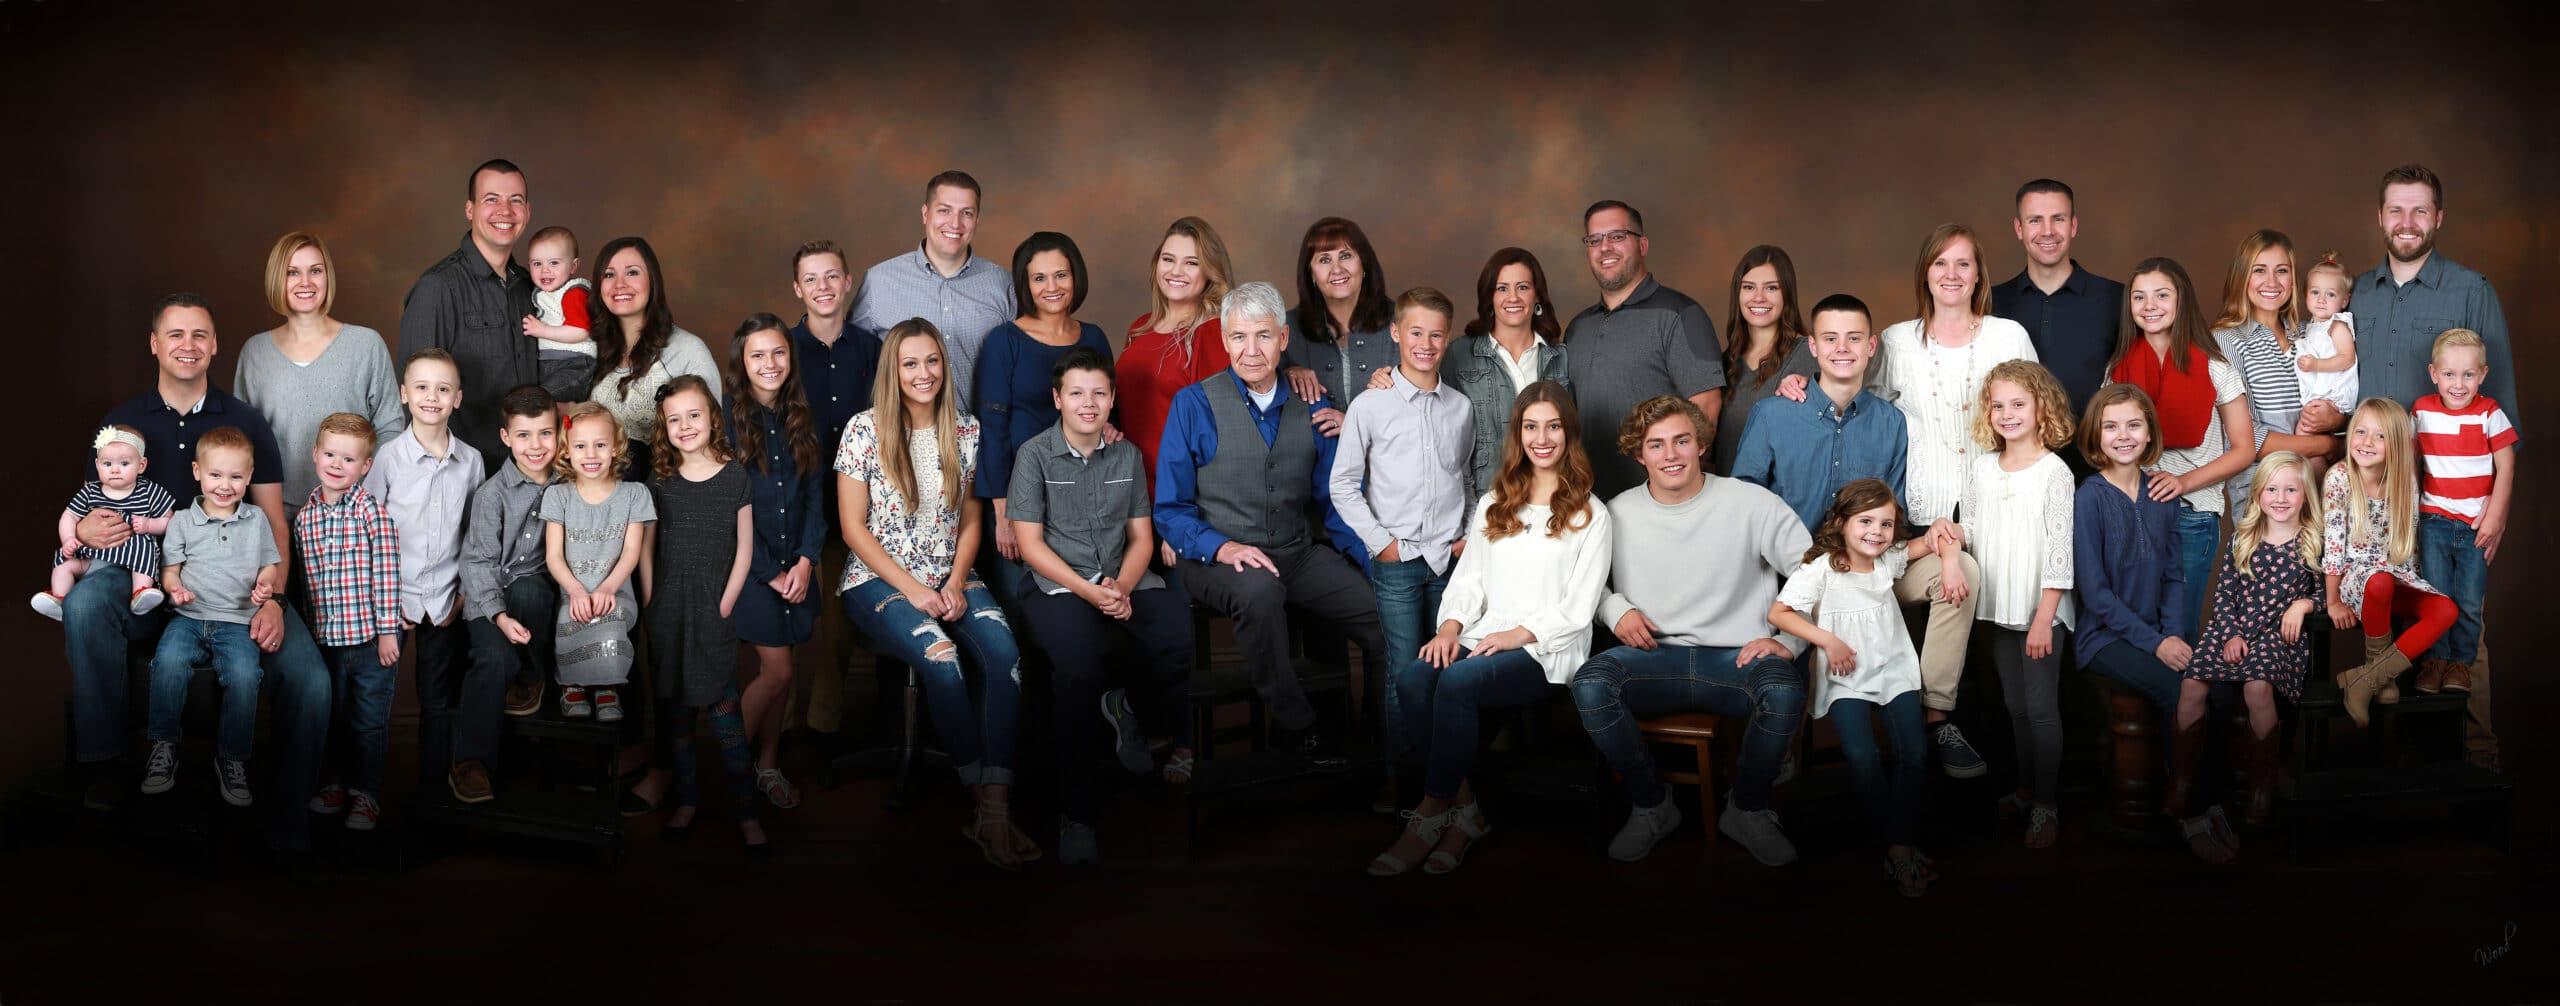 utah family photographer, large group photography